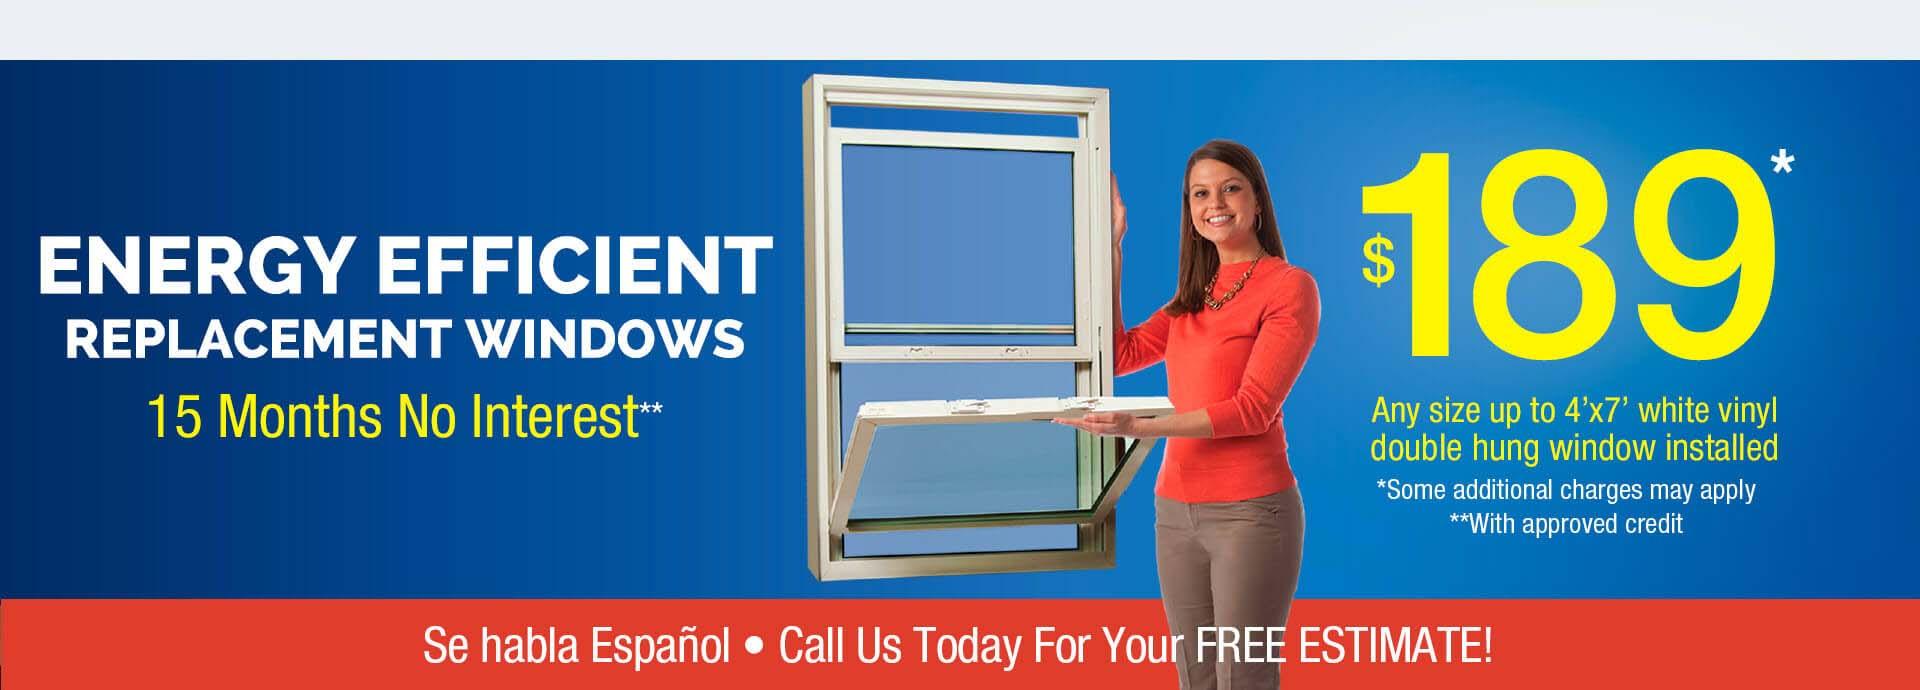 Window financing